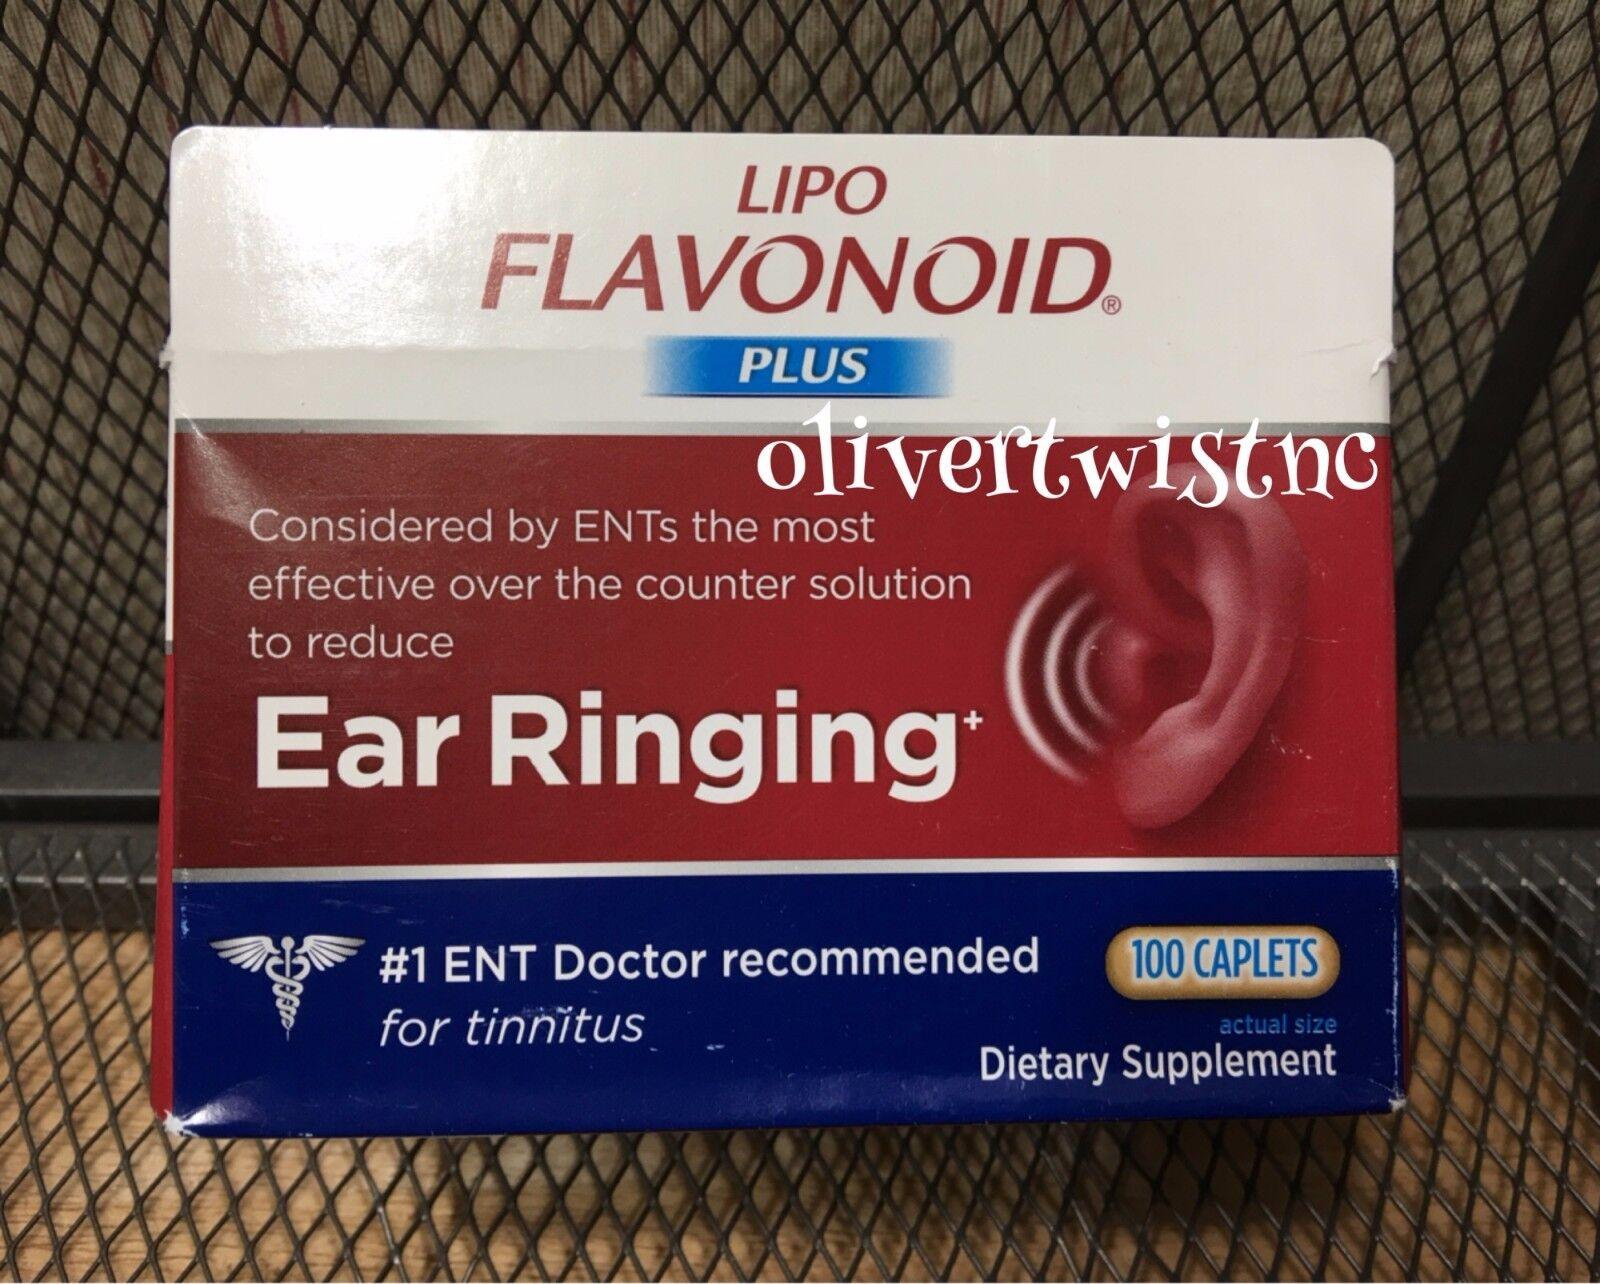 Lipo-Flavonoid Plus 100 Caplets Inner Ear Ringing Health JANUARY 2023  #1001